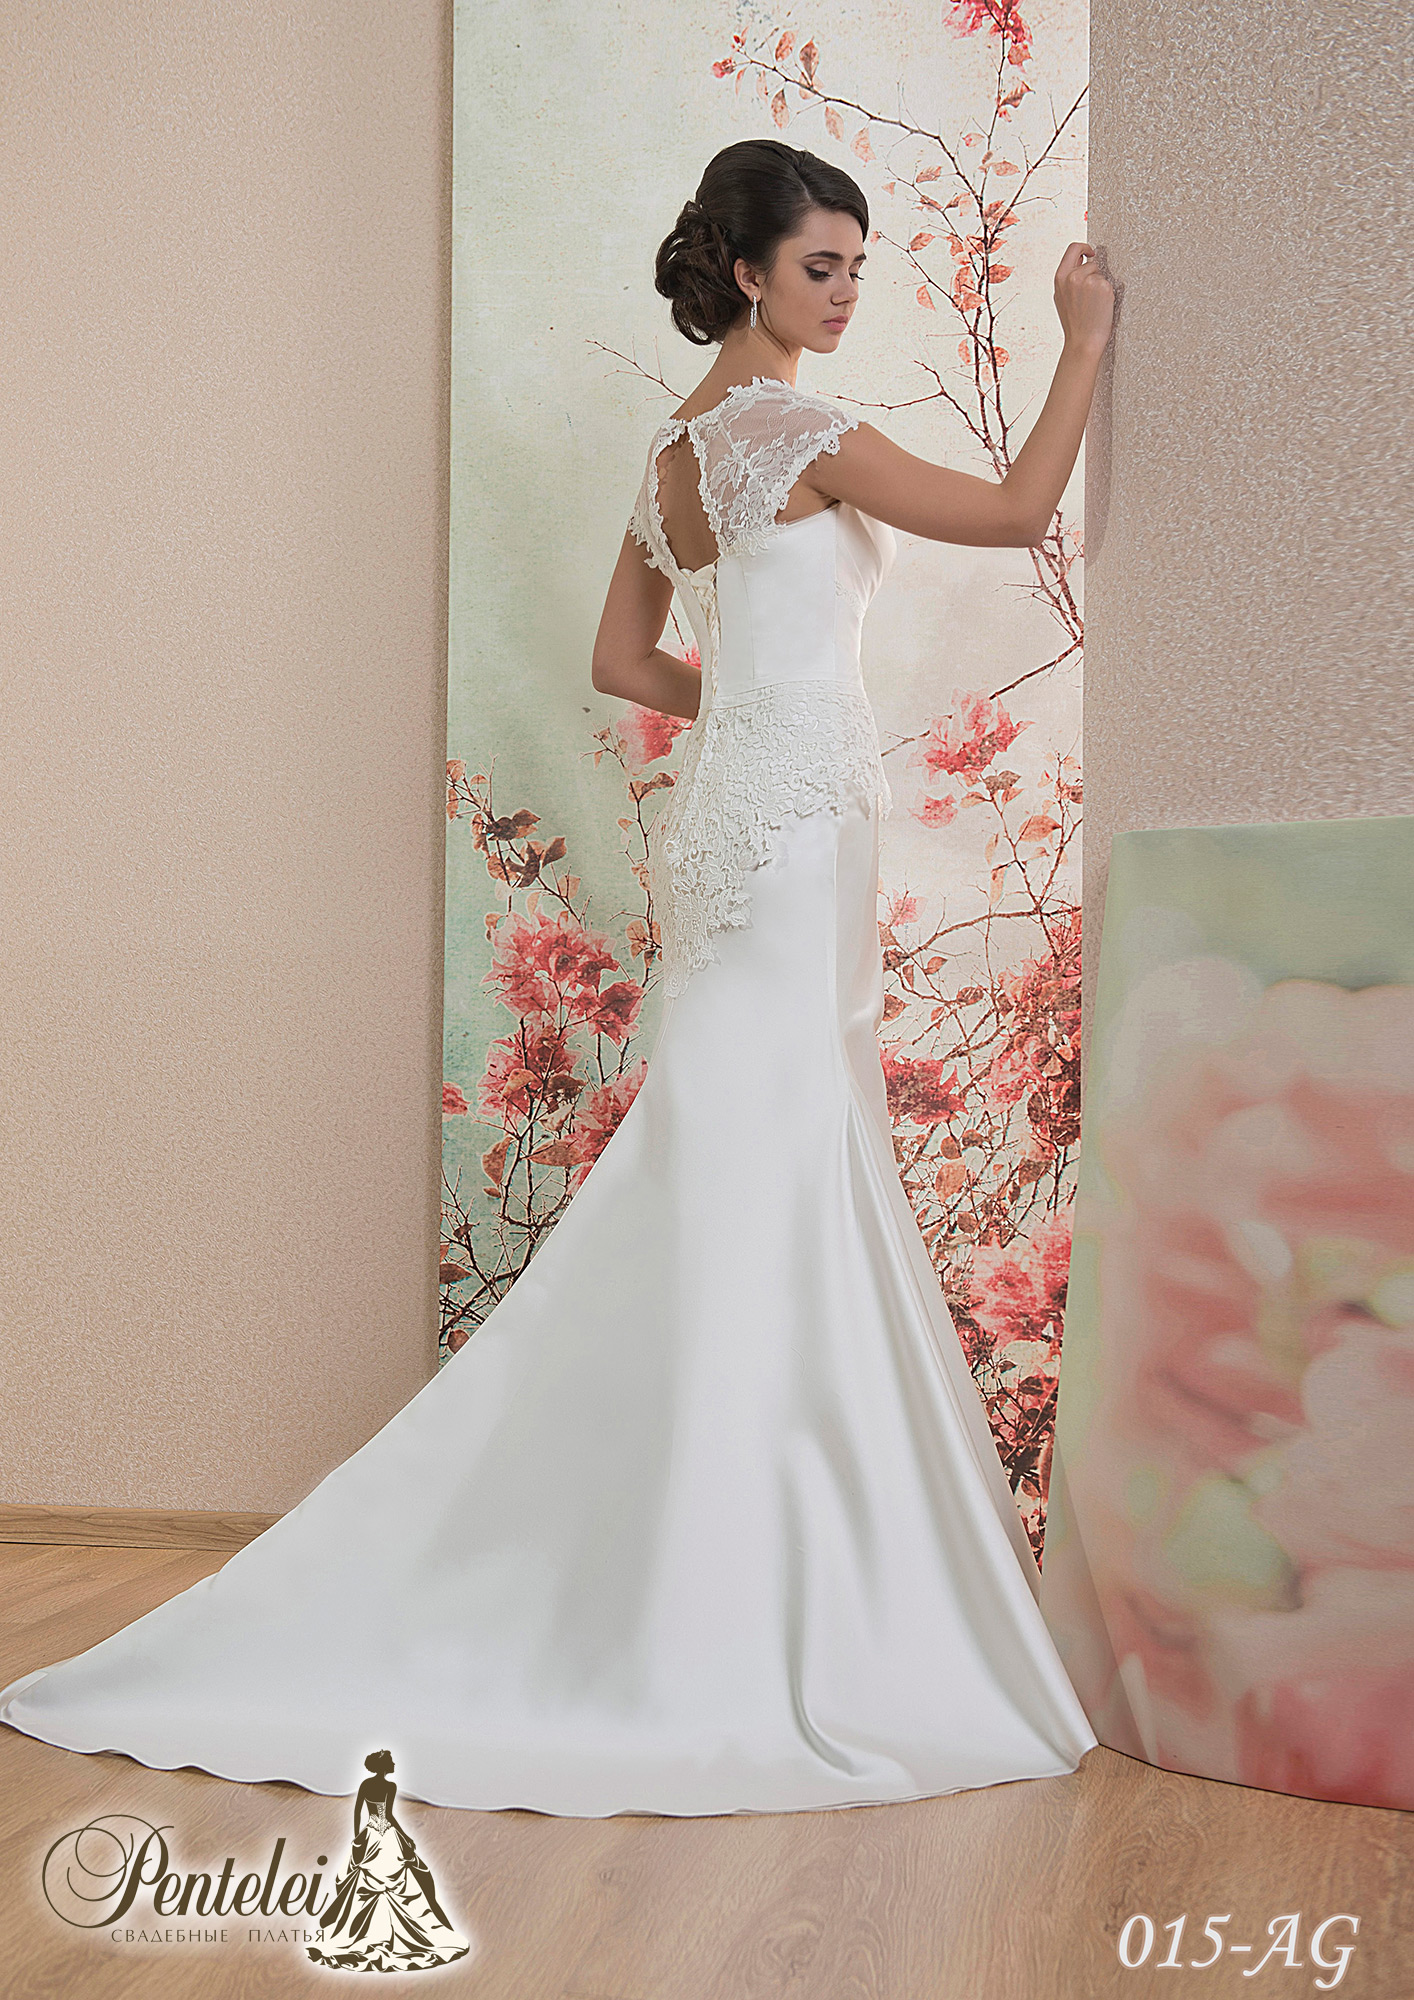 015-AG | Cumpăra rochii de mireasă en-gros de Pentelei